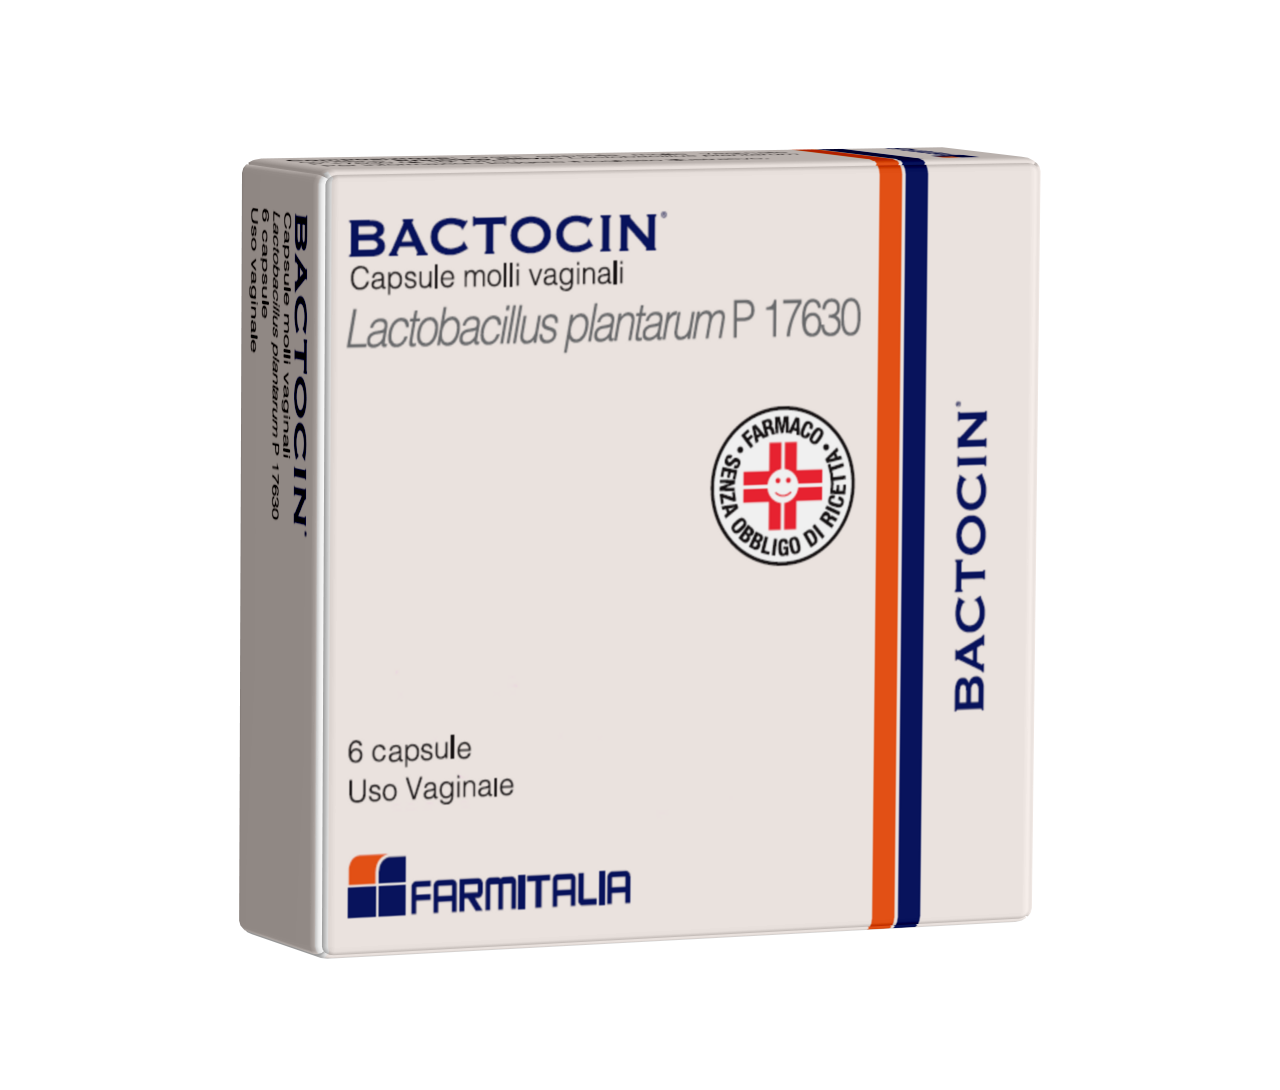 BACTOCIN*6CPS VAG MOLLI 3G - Farmacia della salute 360